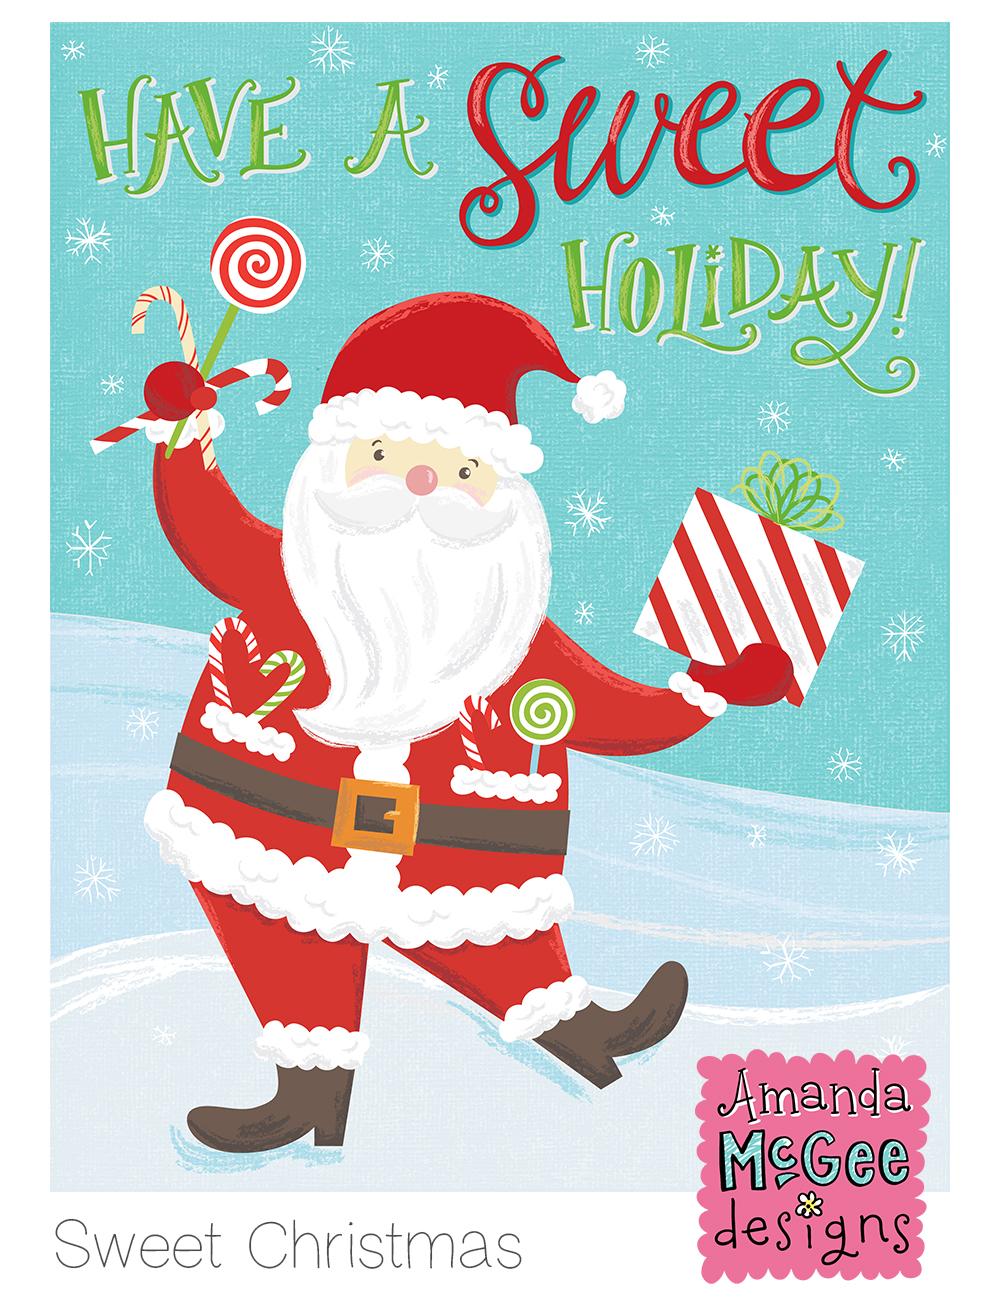 AmandaMcGee_IlloLettering_SweetChristmas-Santa.jpg